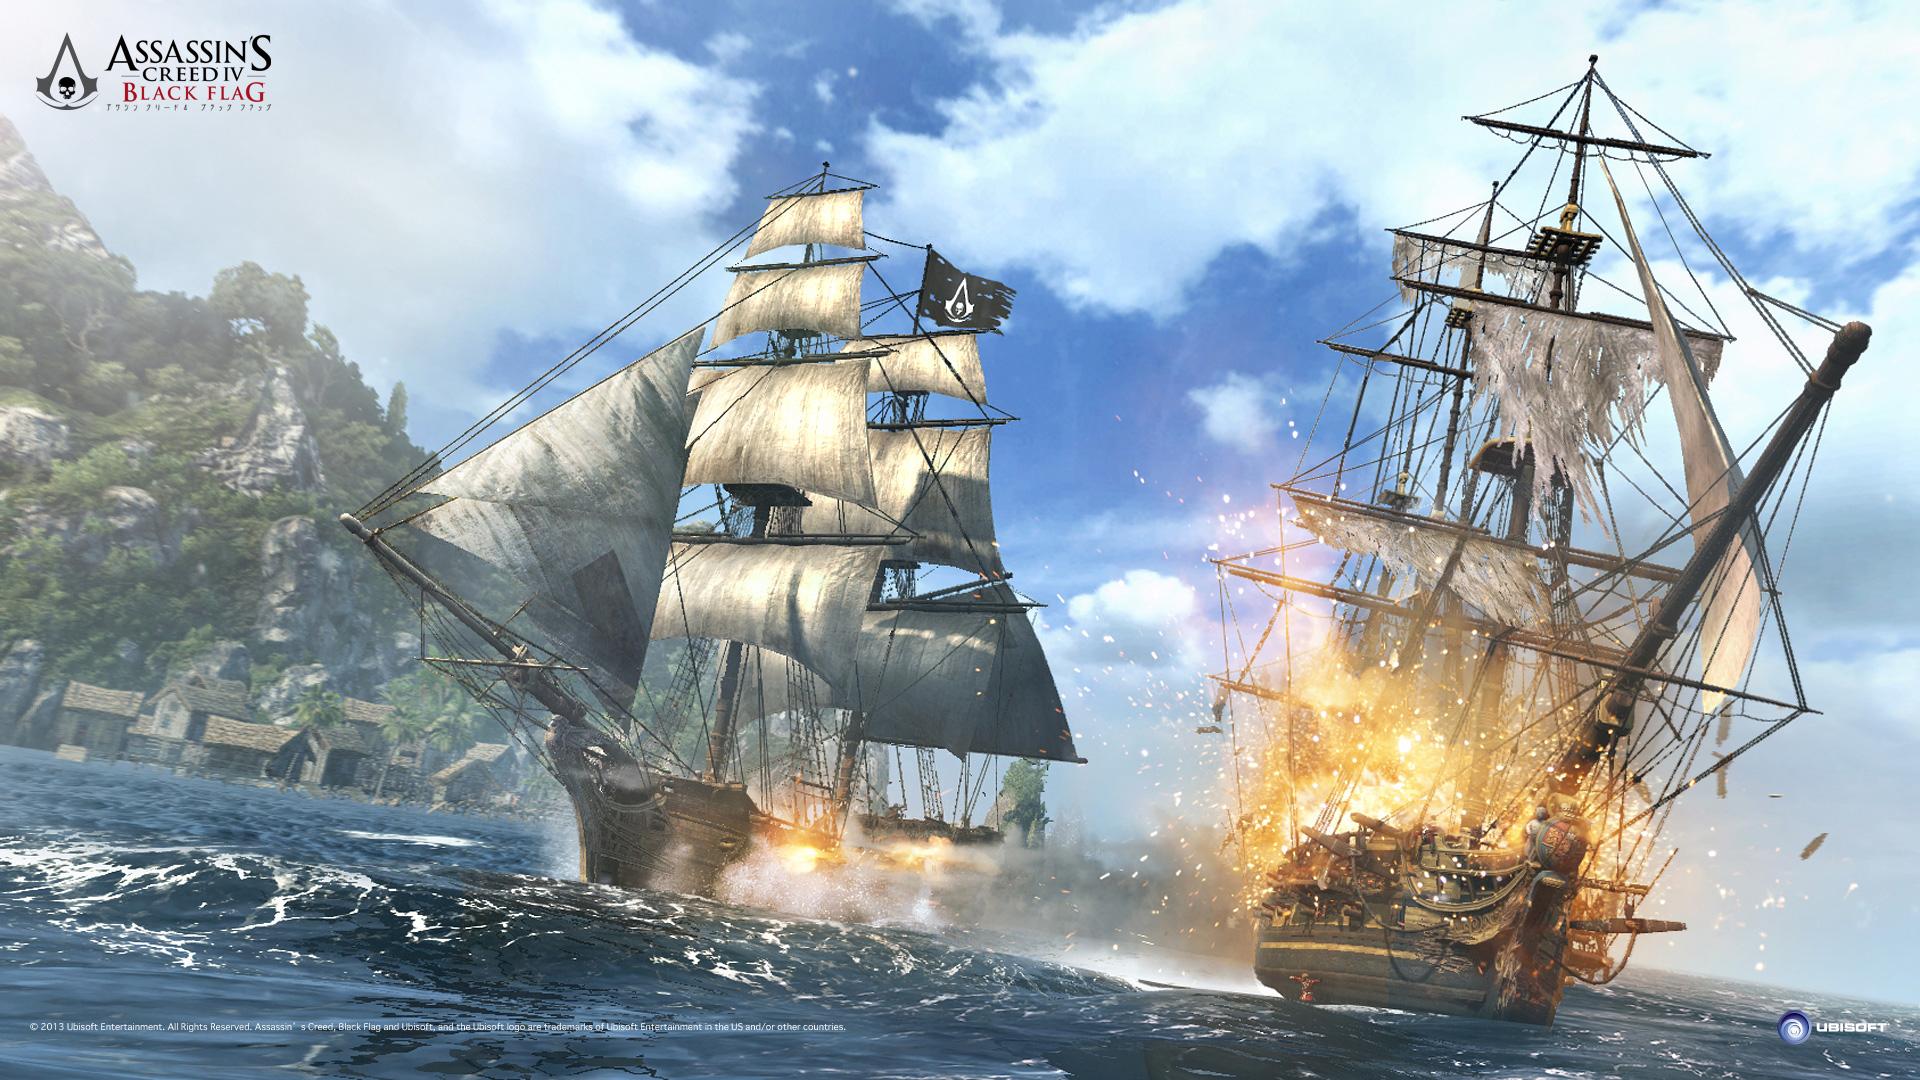 [Recopilación] Assassin's Creed IV: Black Flag Naval_battle_ACIV